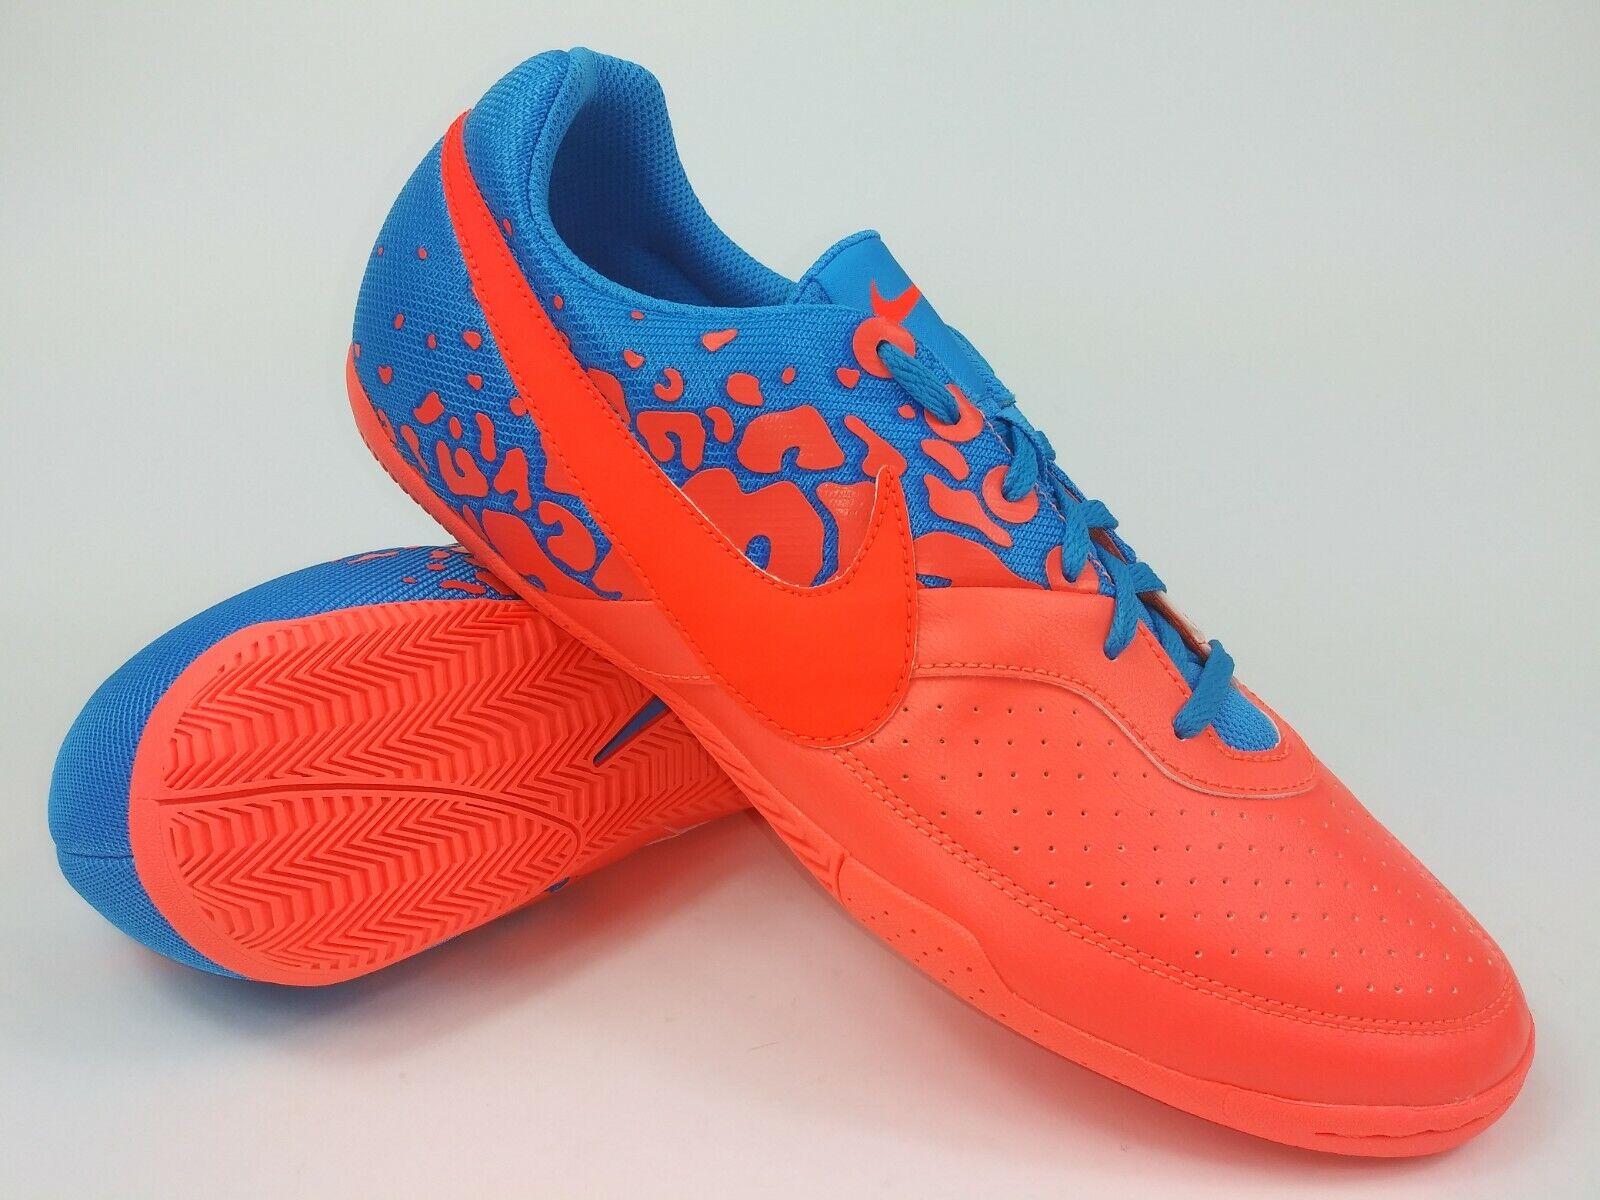 Nike Hombre Raro Elastico II Calzado de Fútbol Indoor 580454-884 Mango Talla 8.5